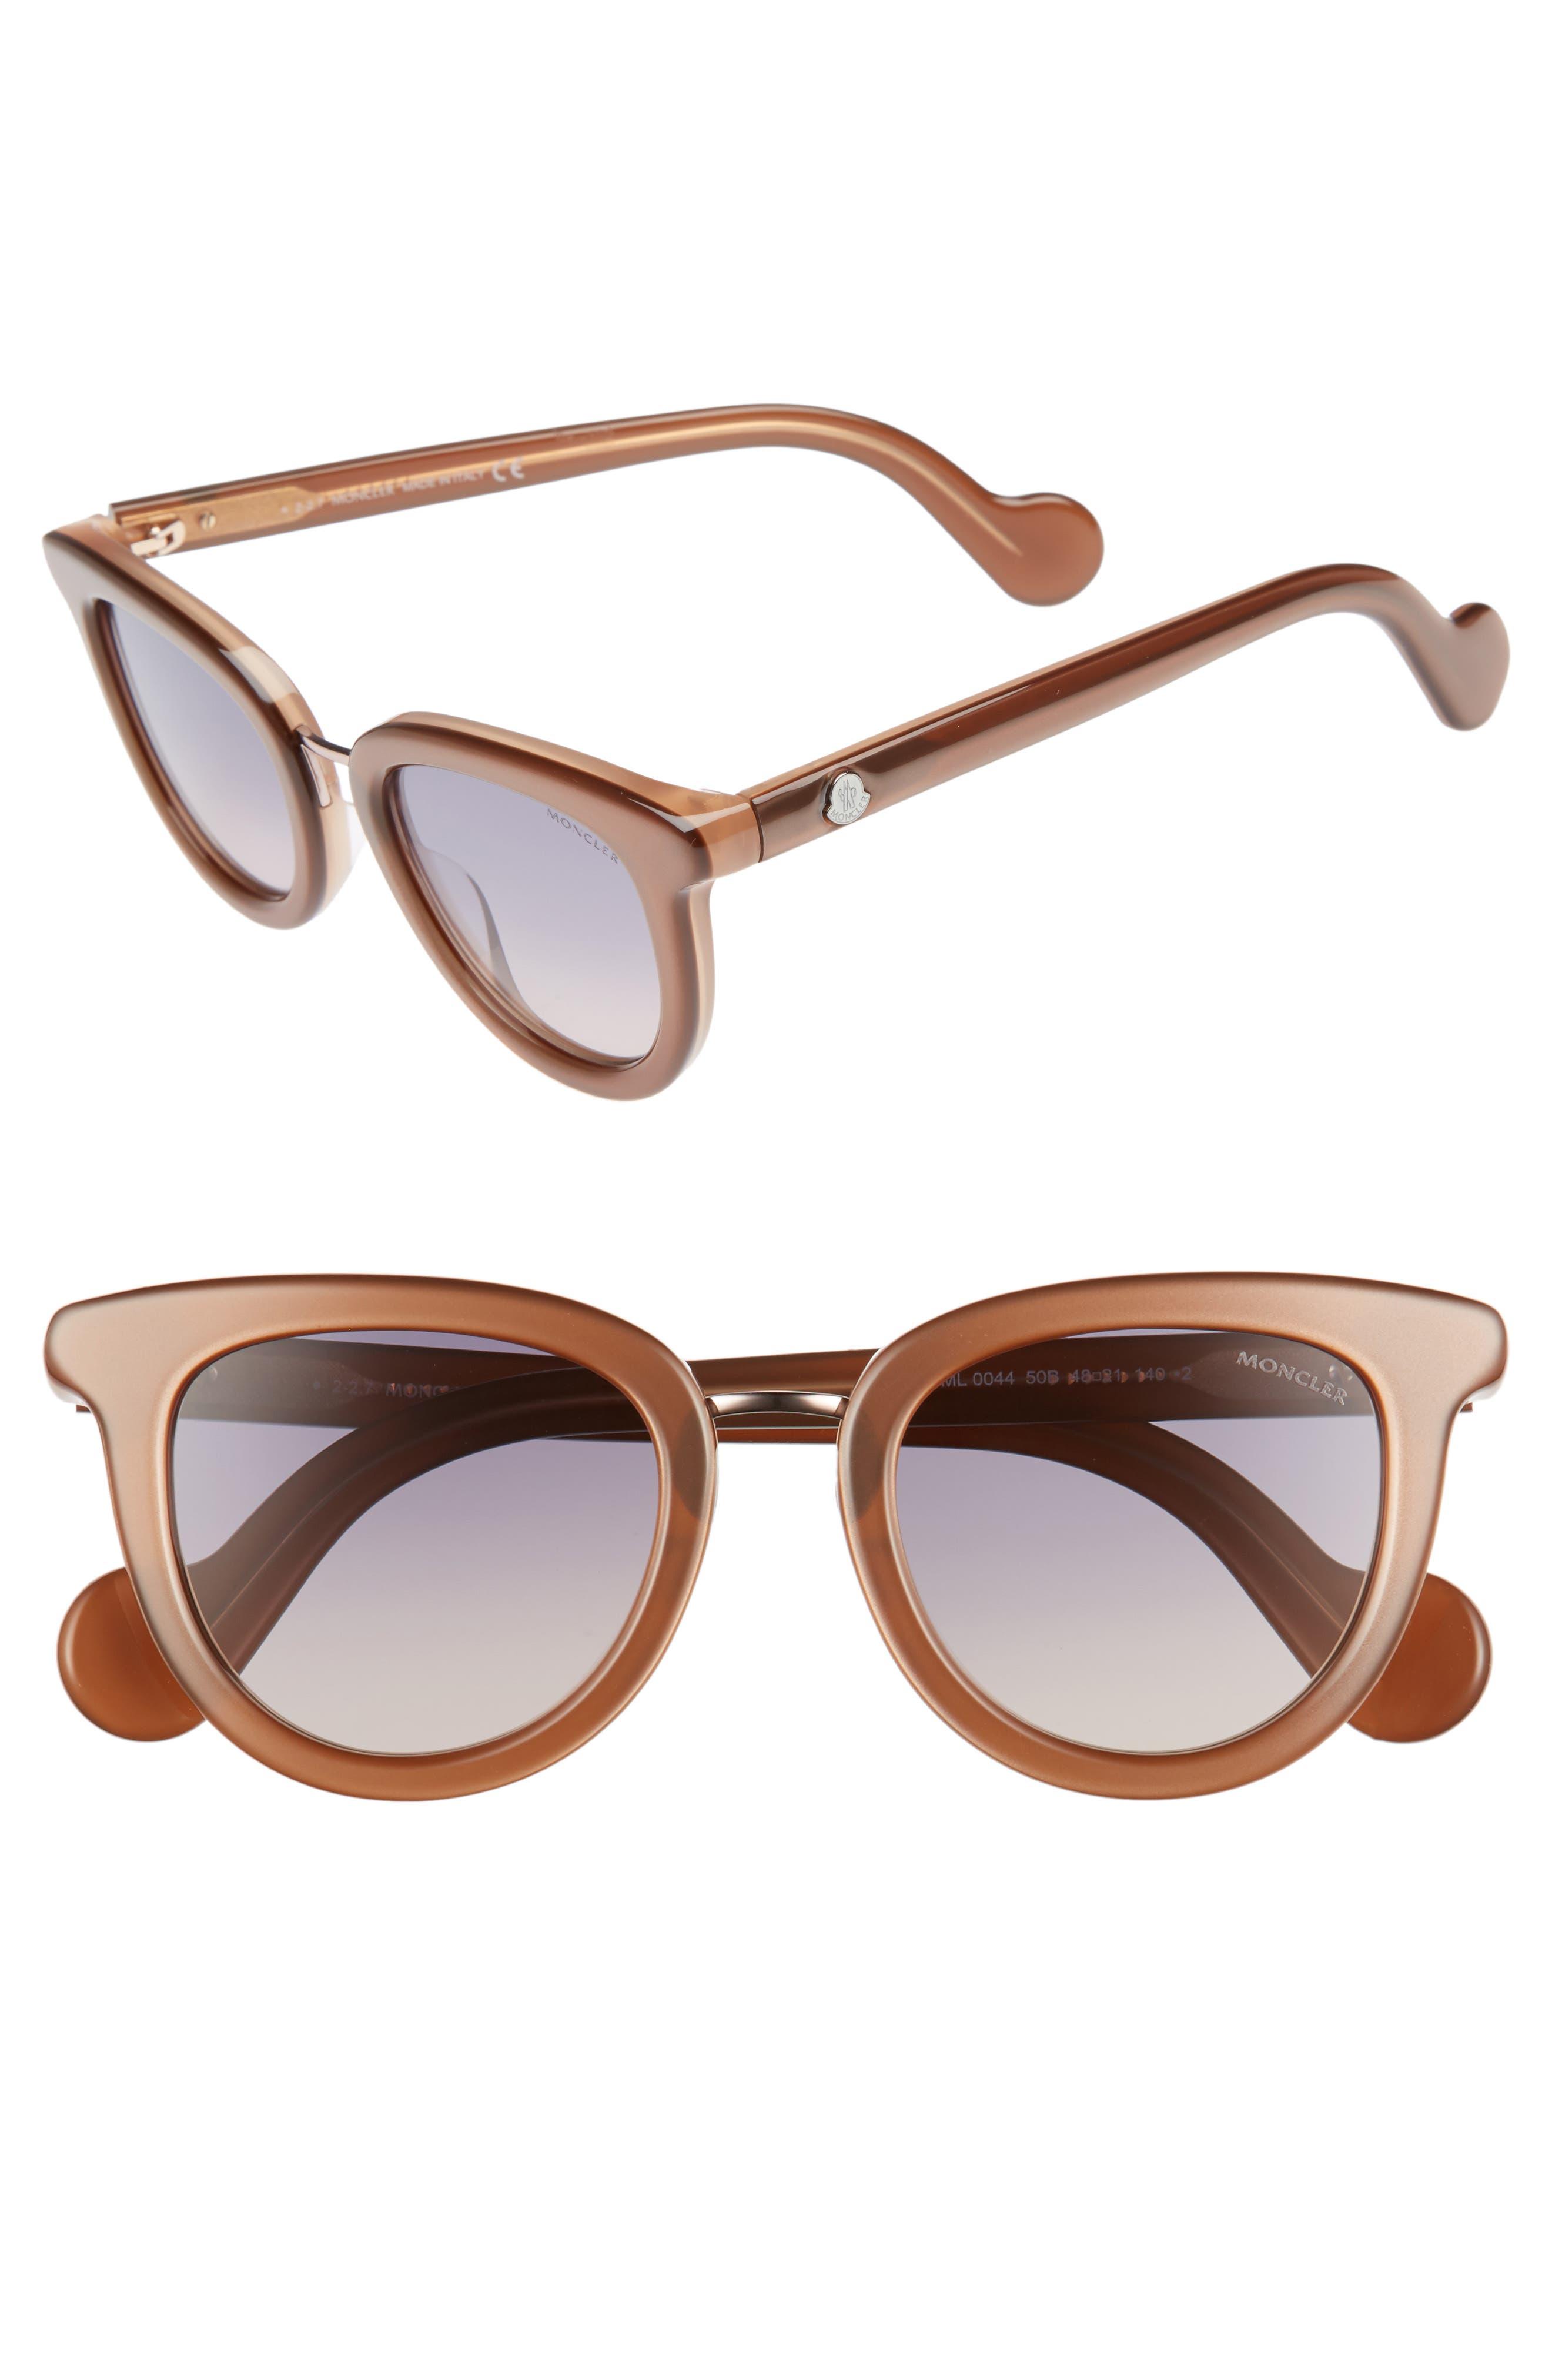 Main Image - Moncler 48mm Cat Eye Sunglasses